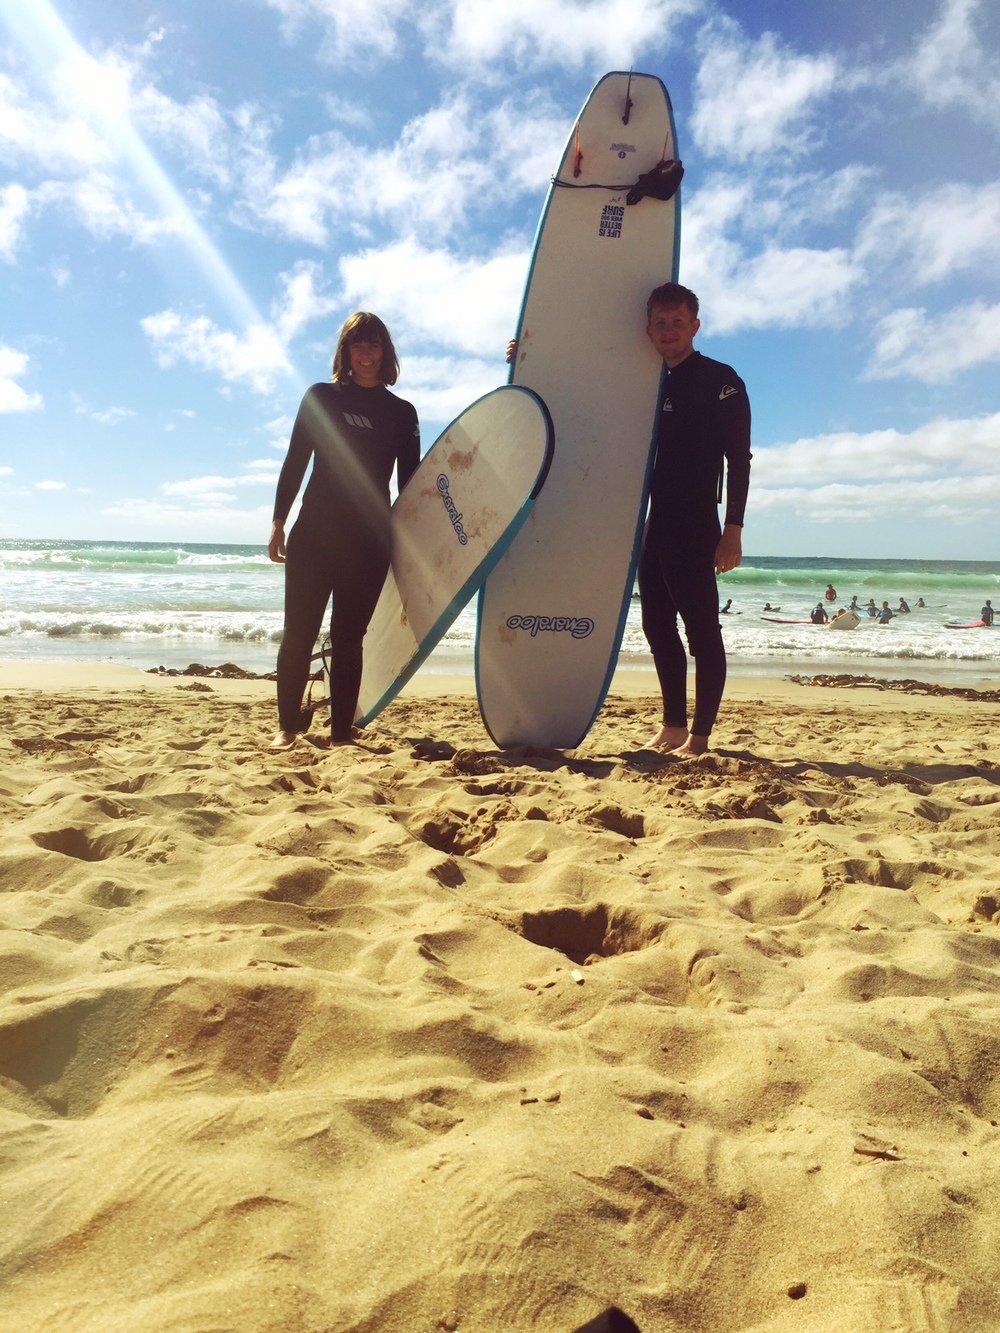 Surf pals.